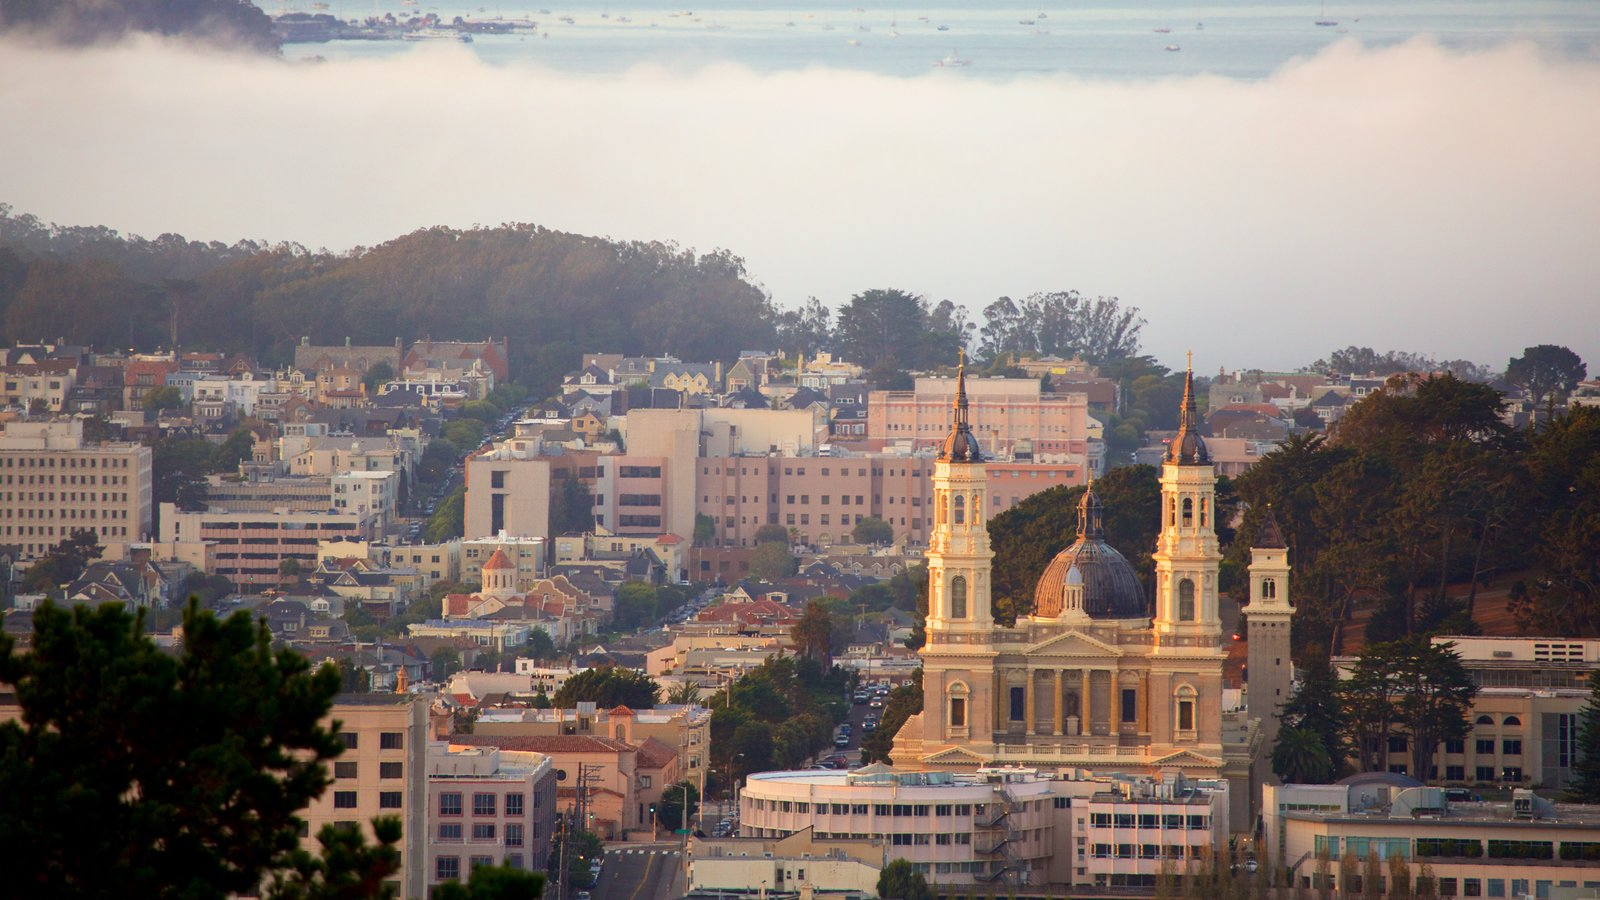 Twin Peaks caracterizando neblina e uma cidade